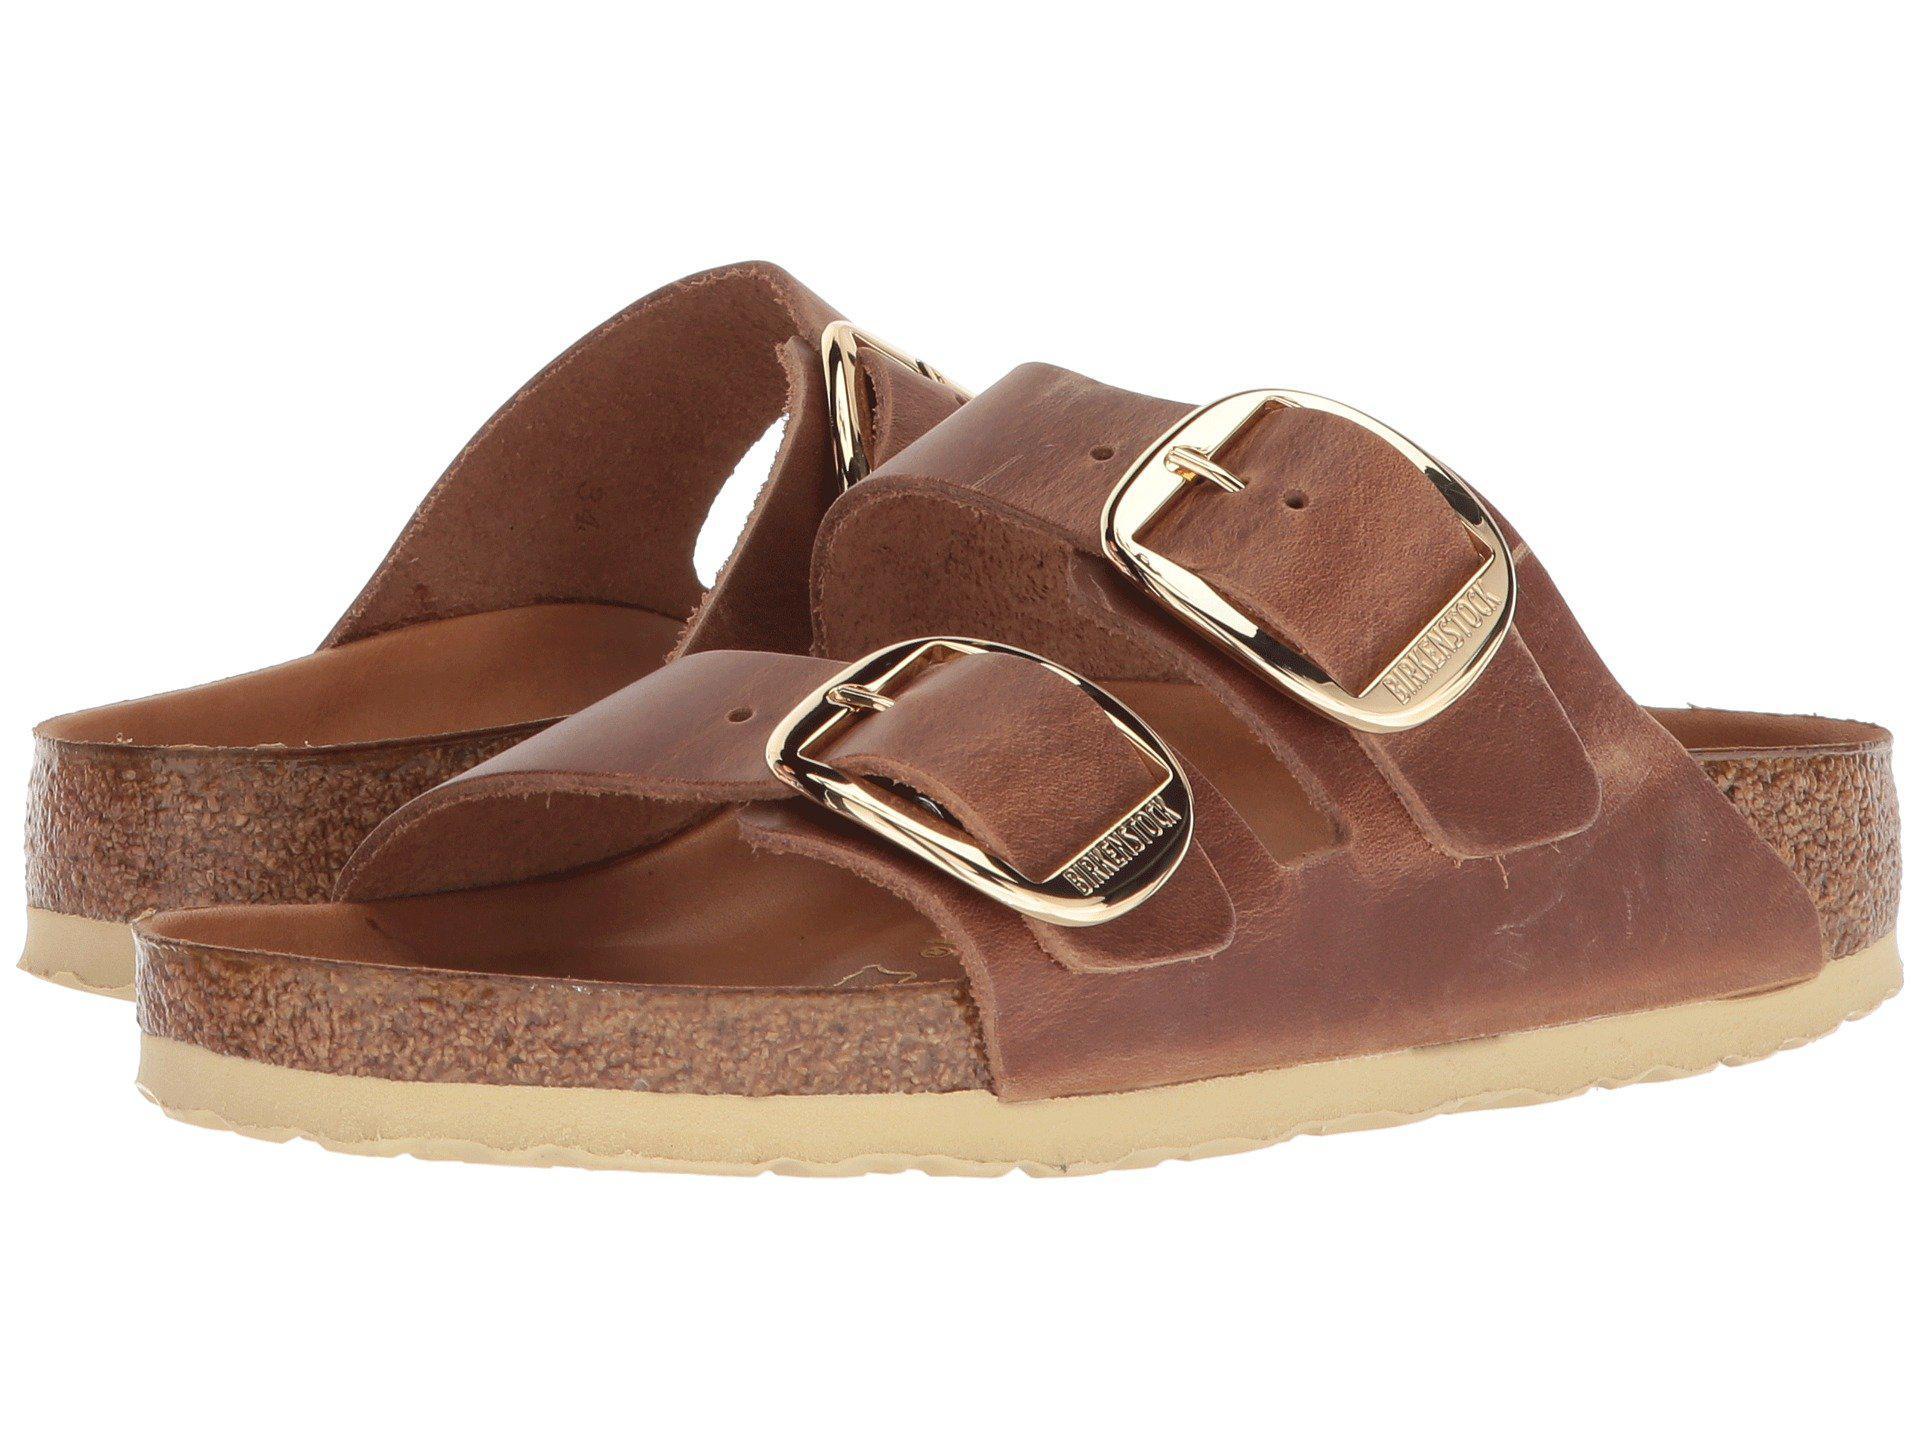 6387dd5e699 Lyst - Birkenstock Arizona Big Buckle Mules   Casual Shoes in Brown